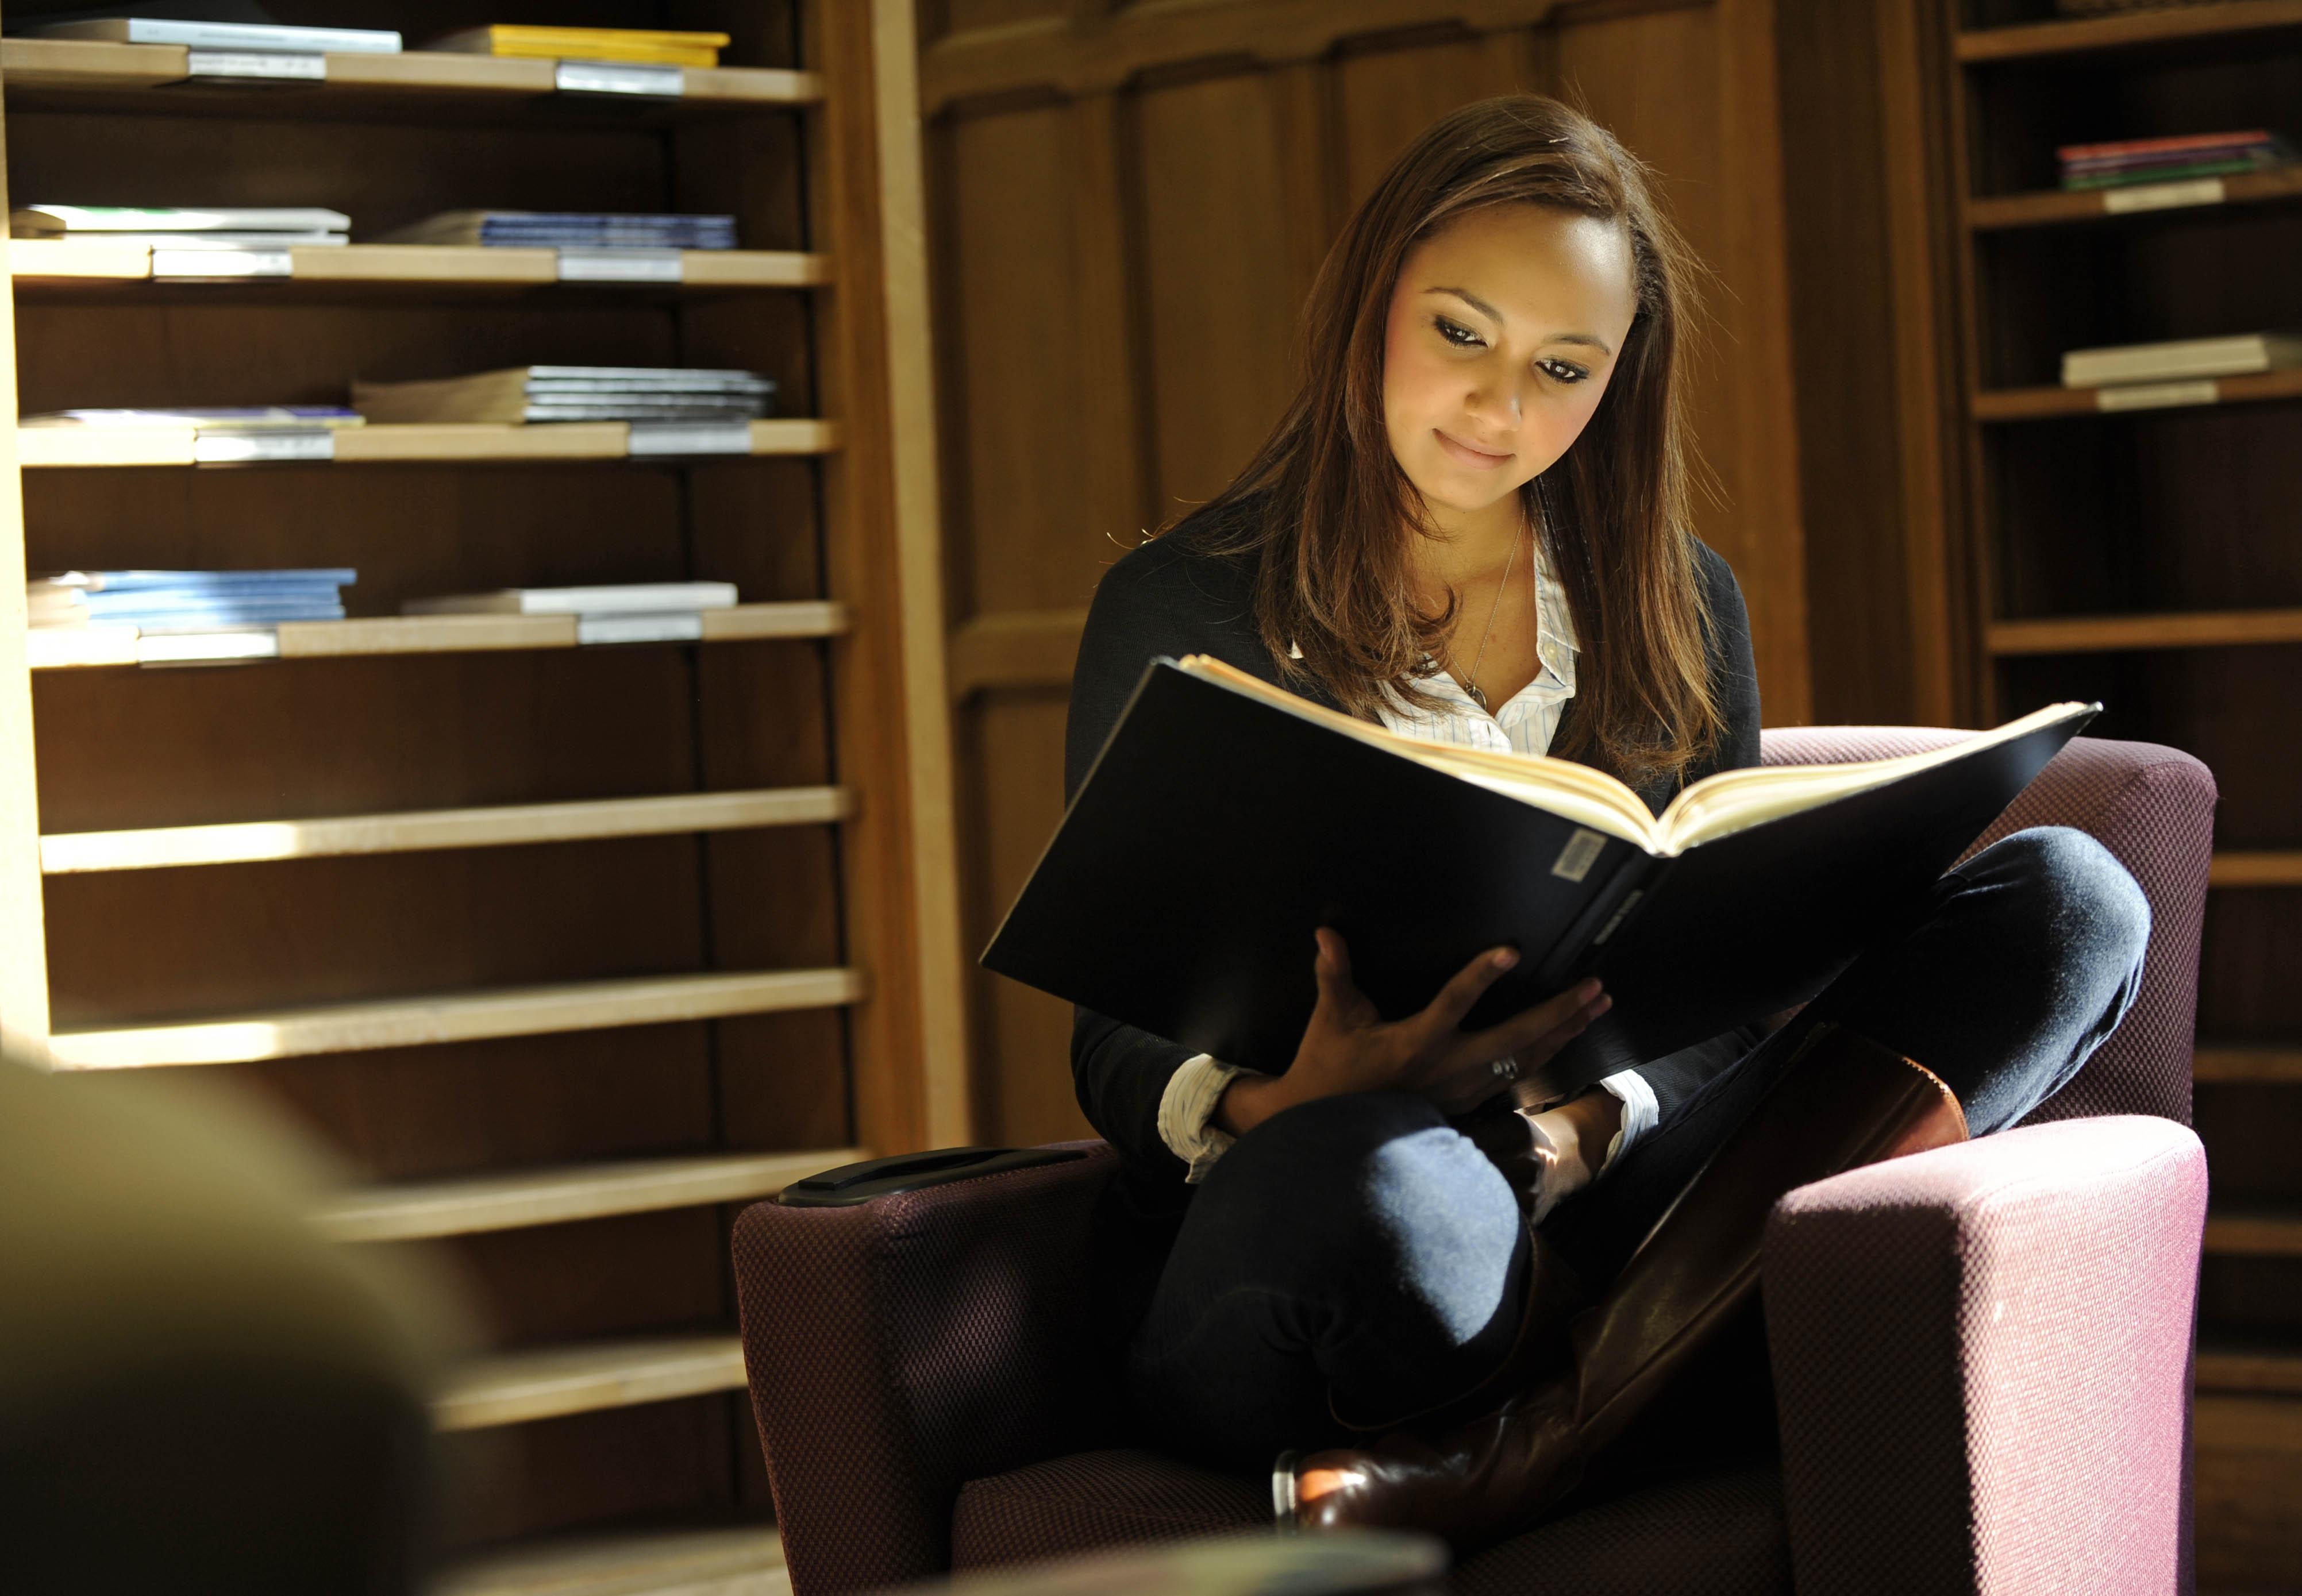 nyu college essay prompt 2014